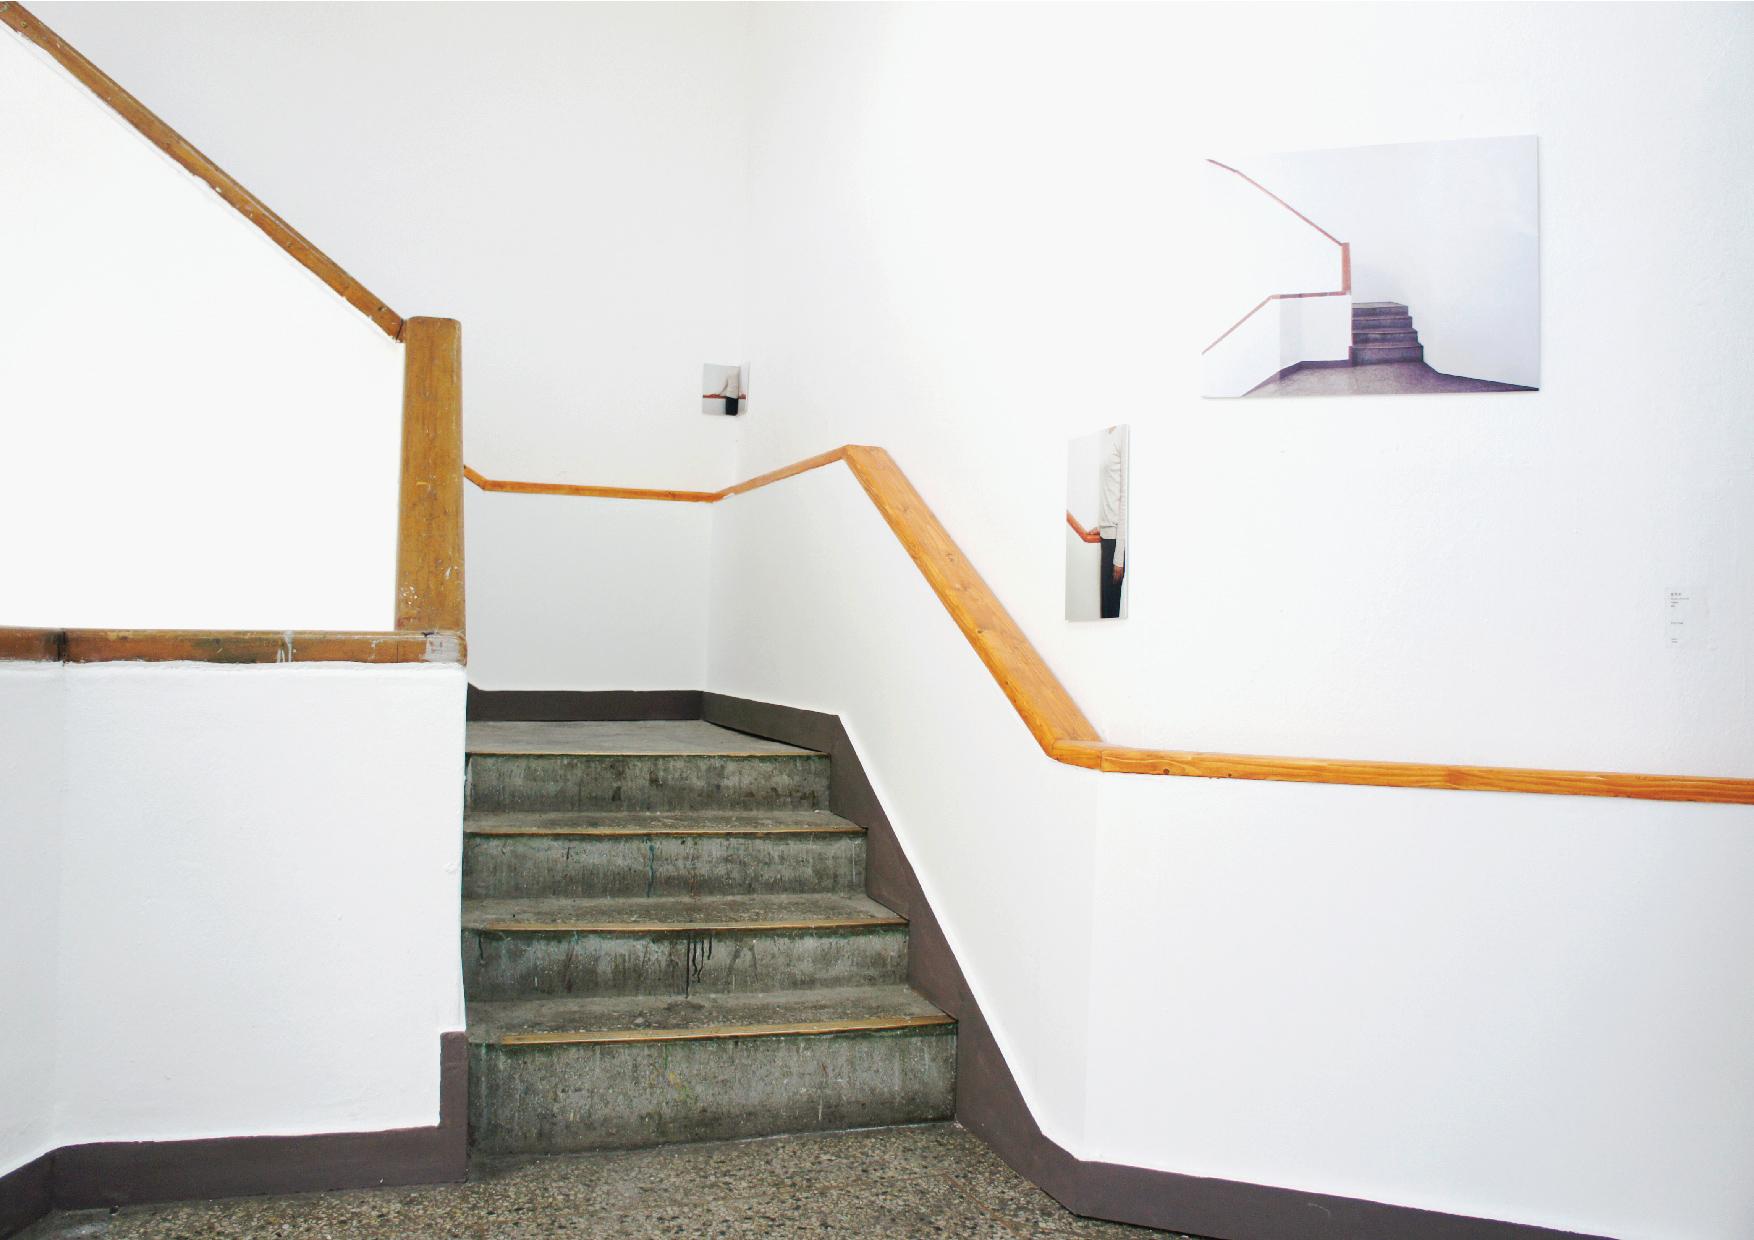 13.155.7cm_Handrail.jpg